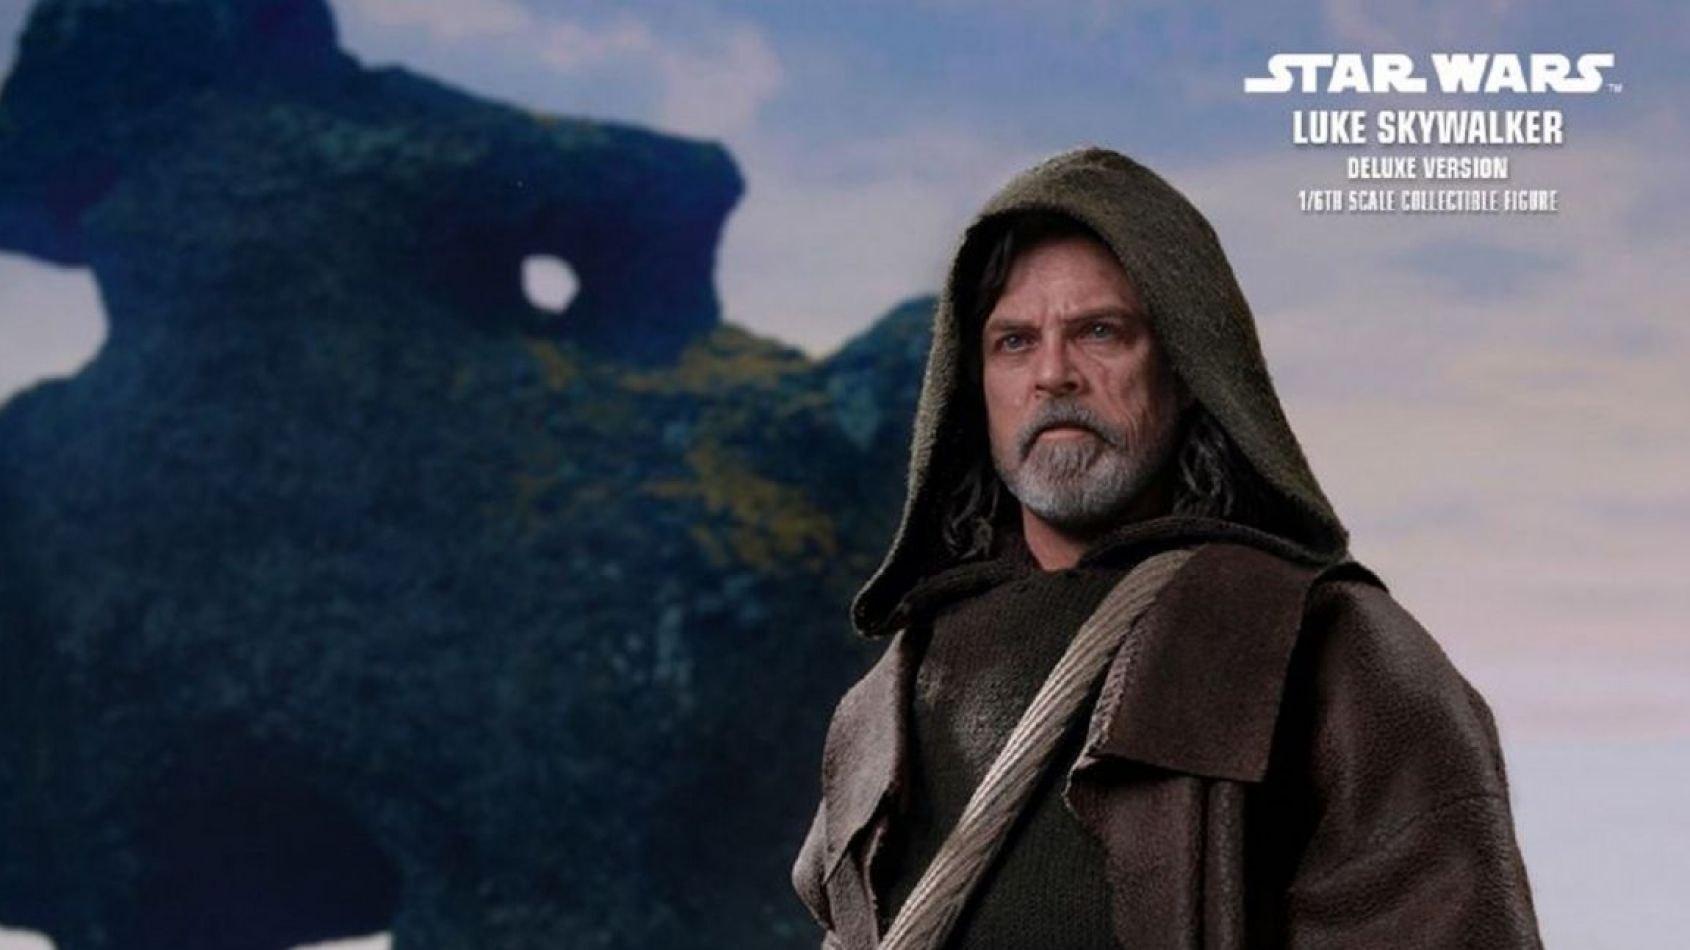 Luke Skywalker des Derniers Jedi par Hot Toys